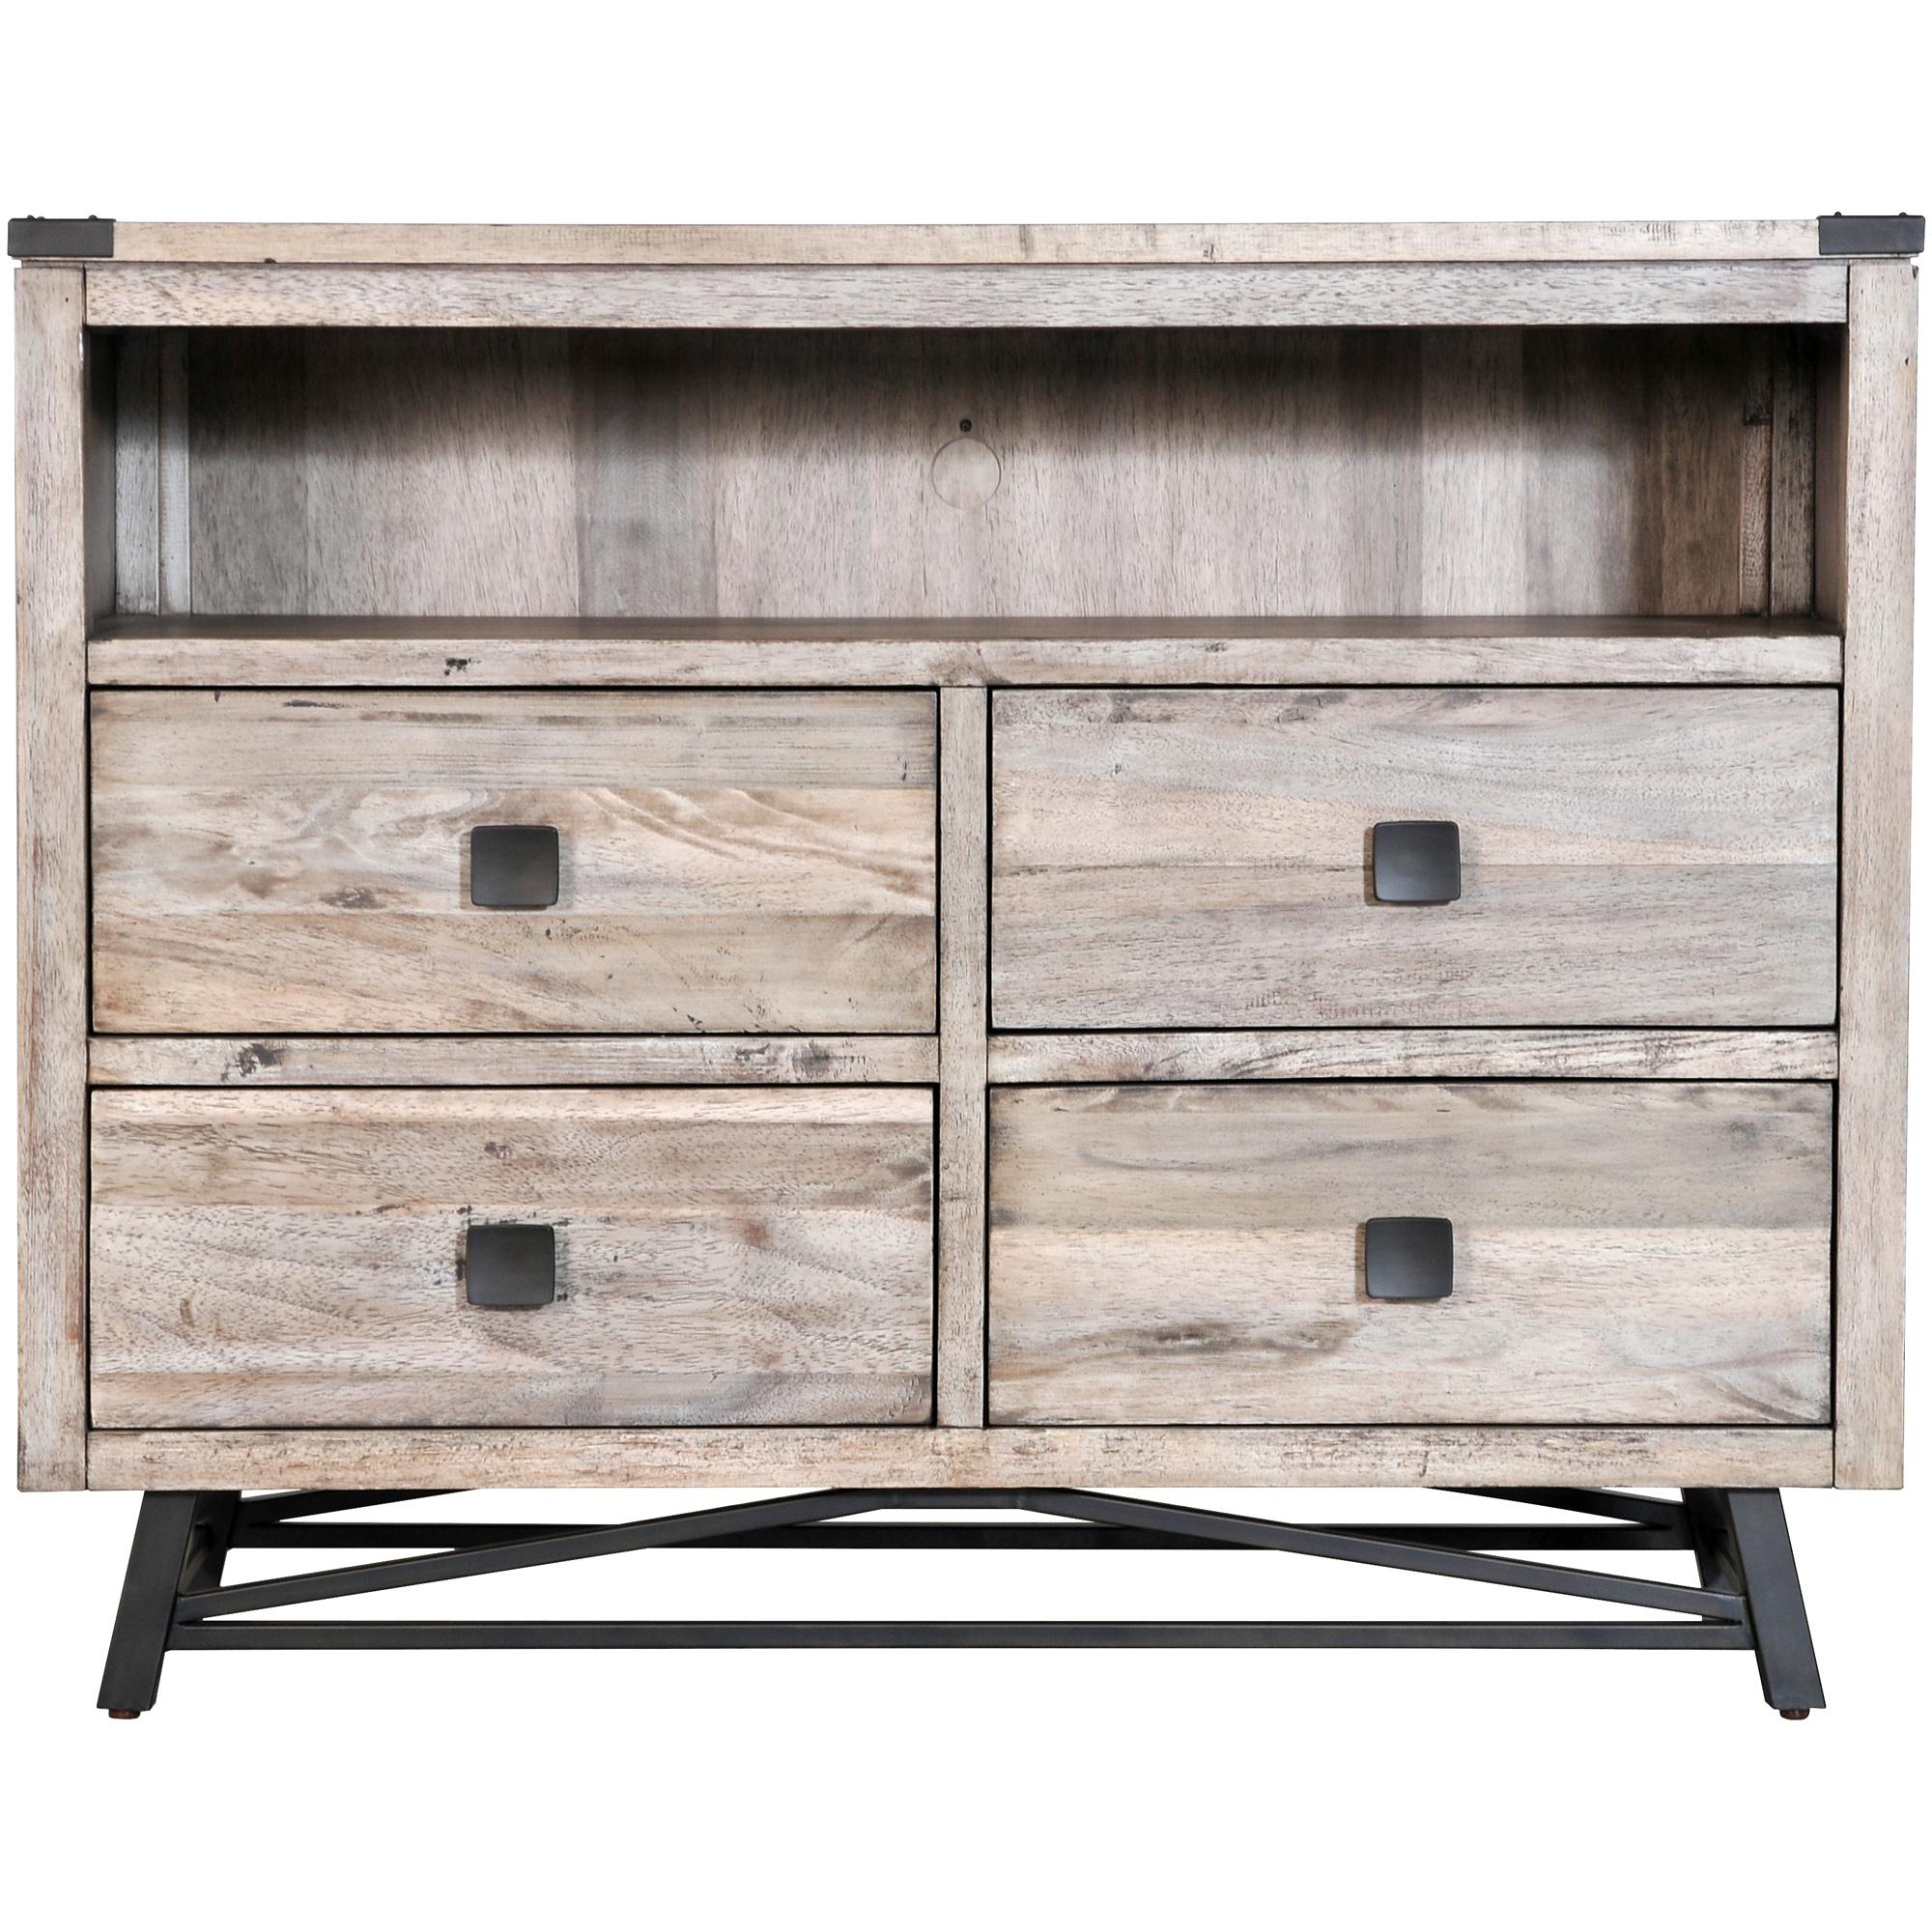 Napa Furniture | Brentwood Chestnut Media Chest